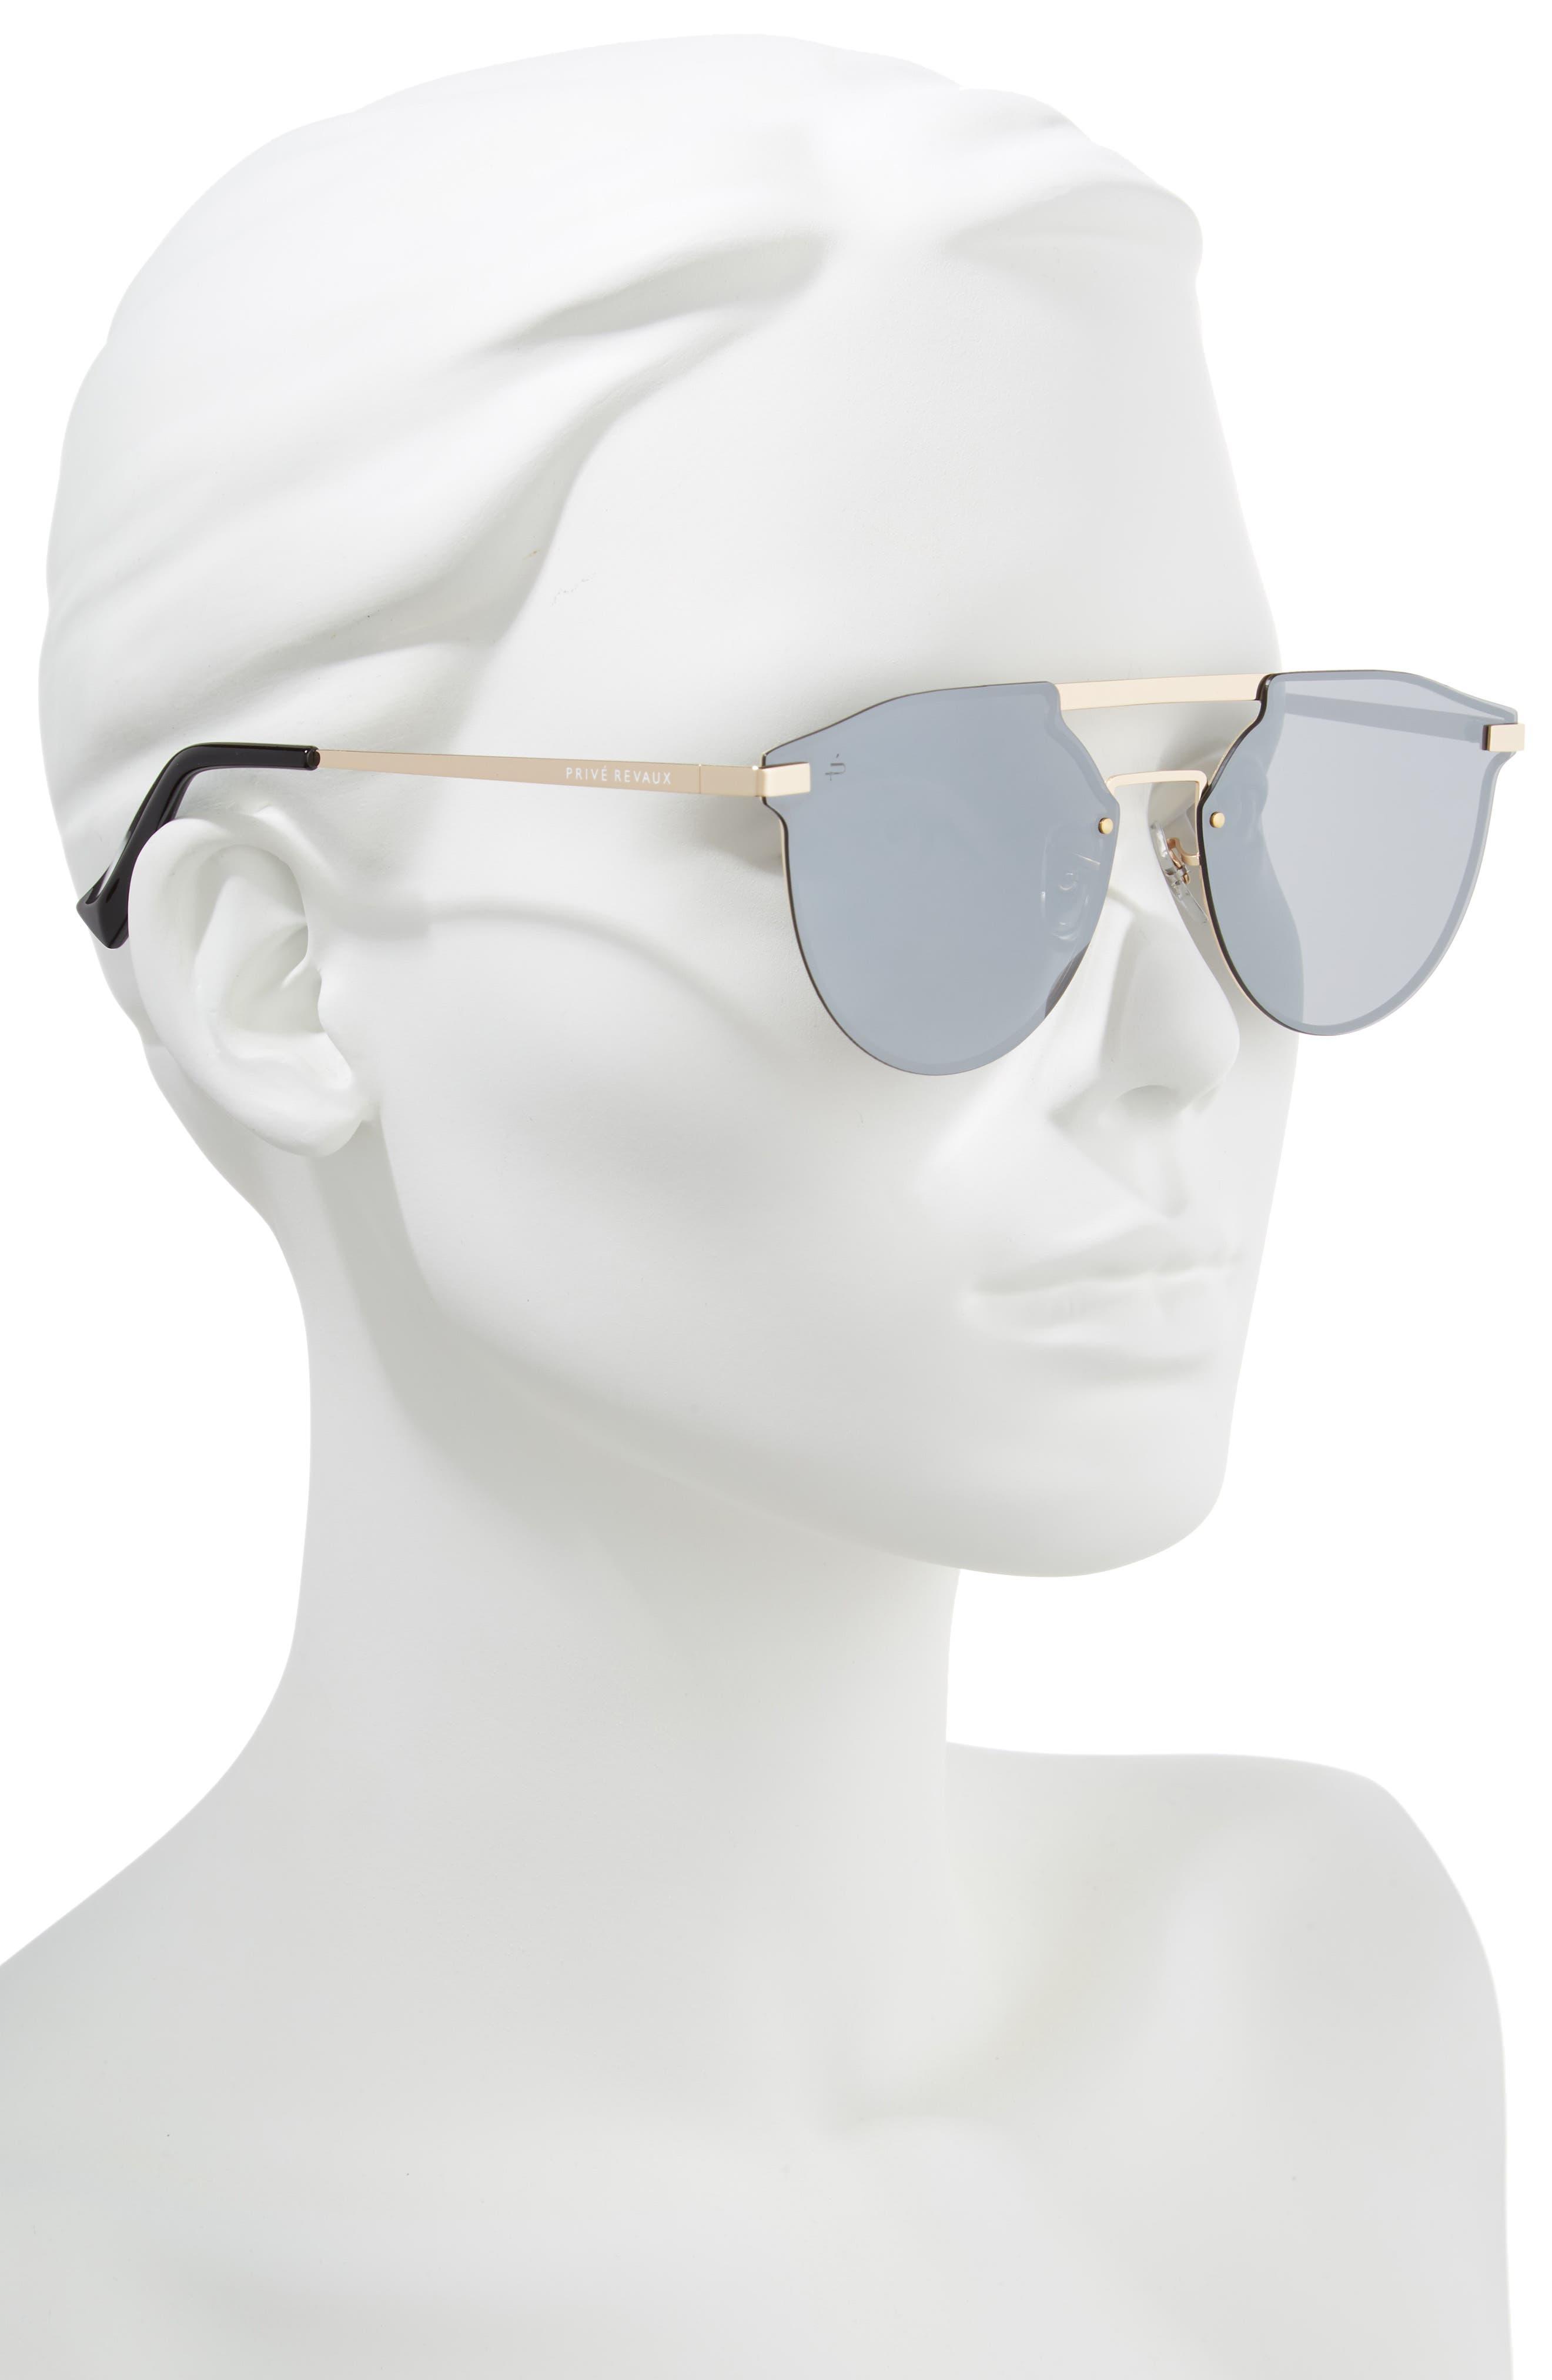 Privé Revaux The Parisian 62mm Aviator Sunglasses,                             Alternate thumbnail 2, color,                             040